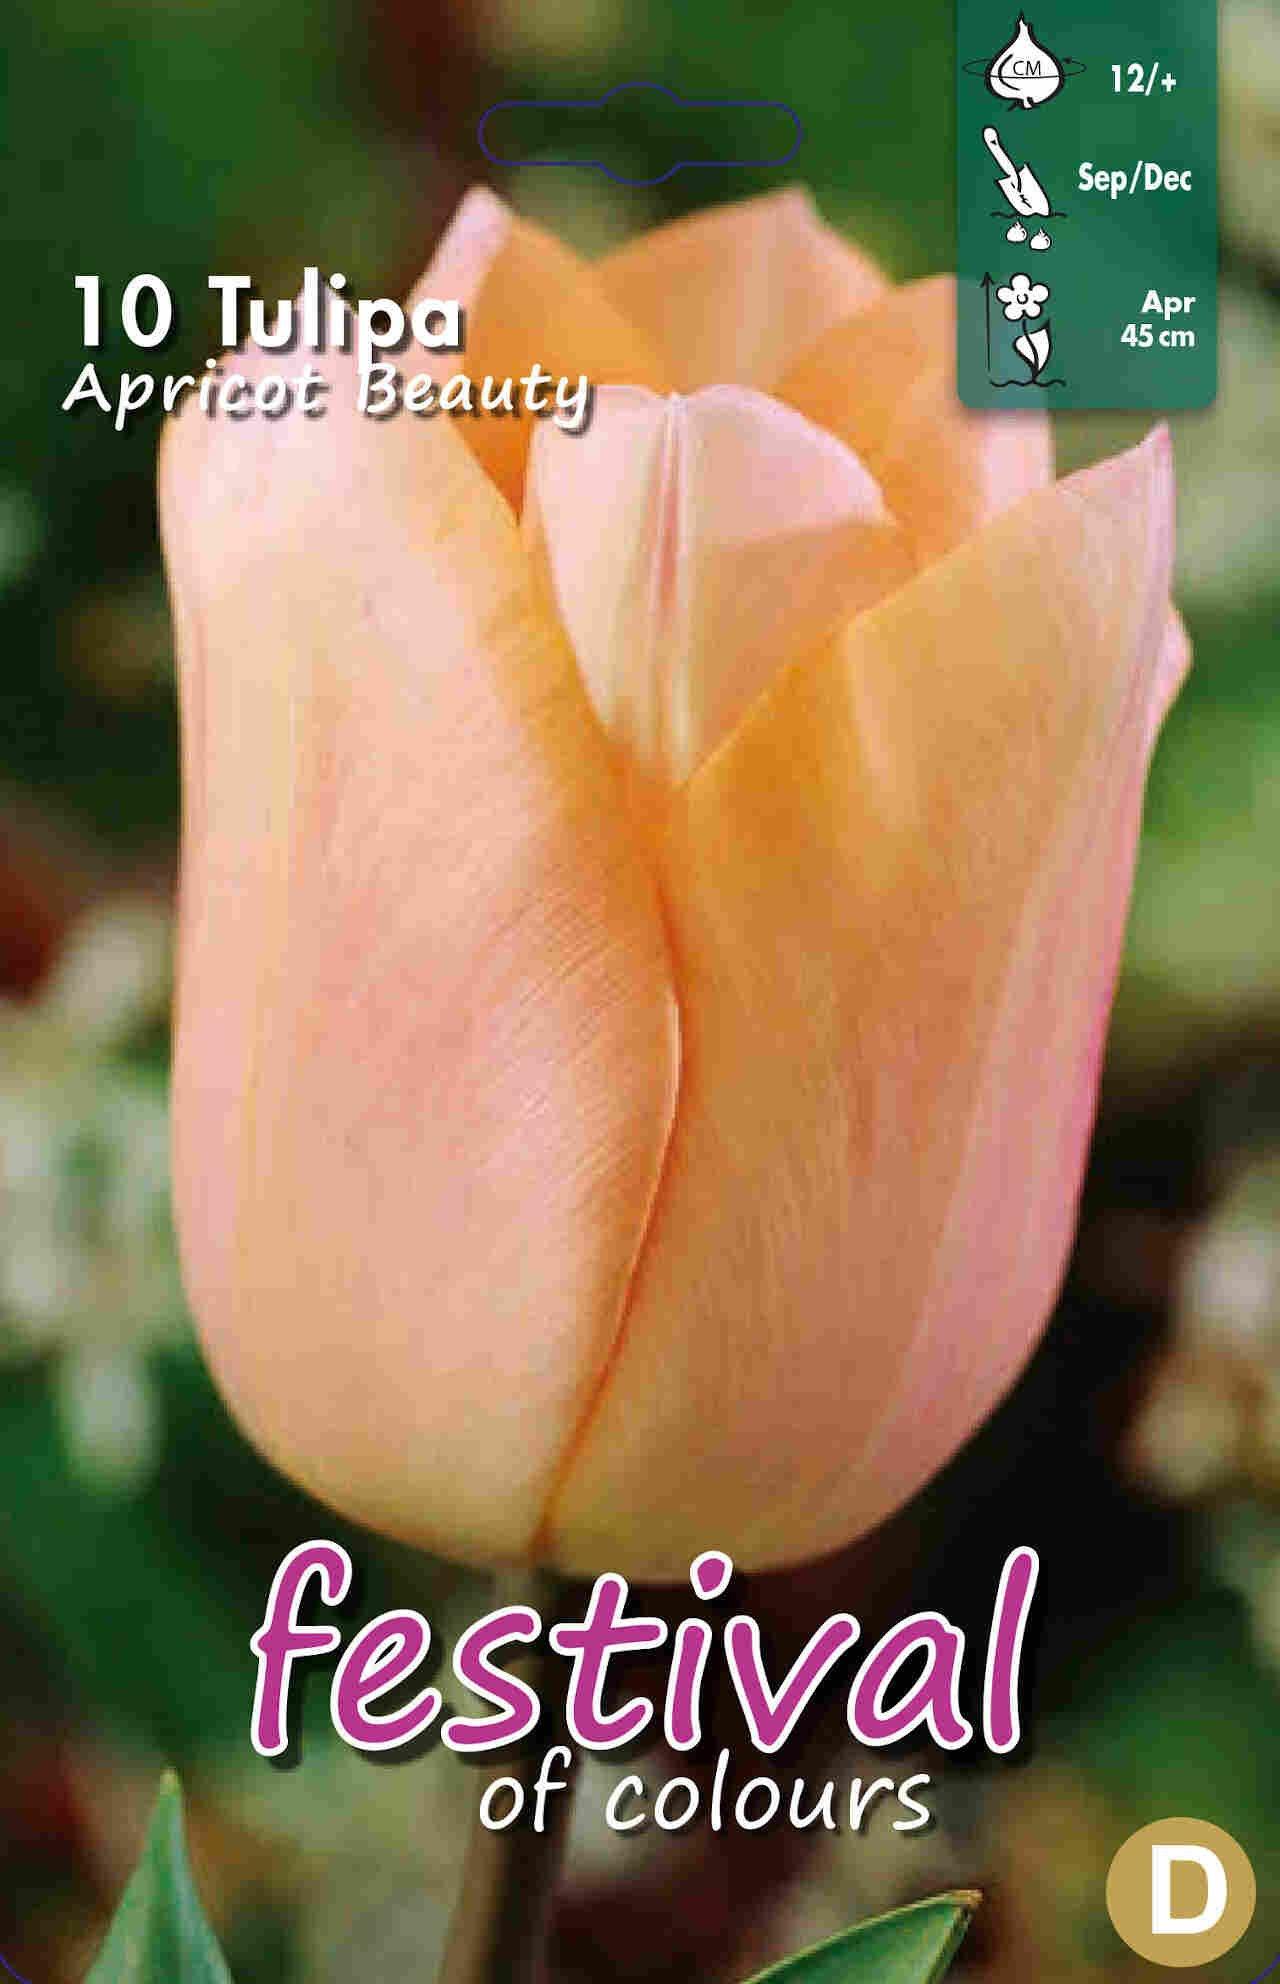 Tulipanløg - Tulipa Apricot Beauty 12/+